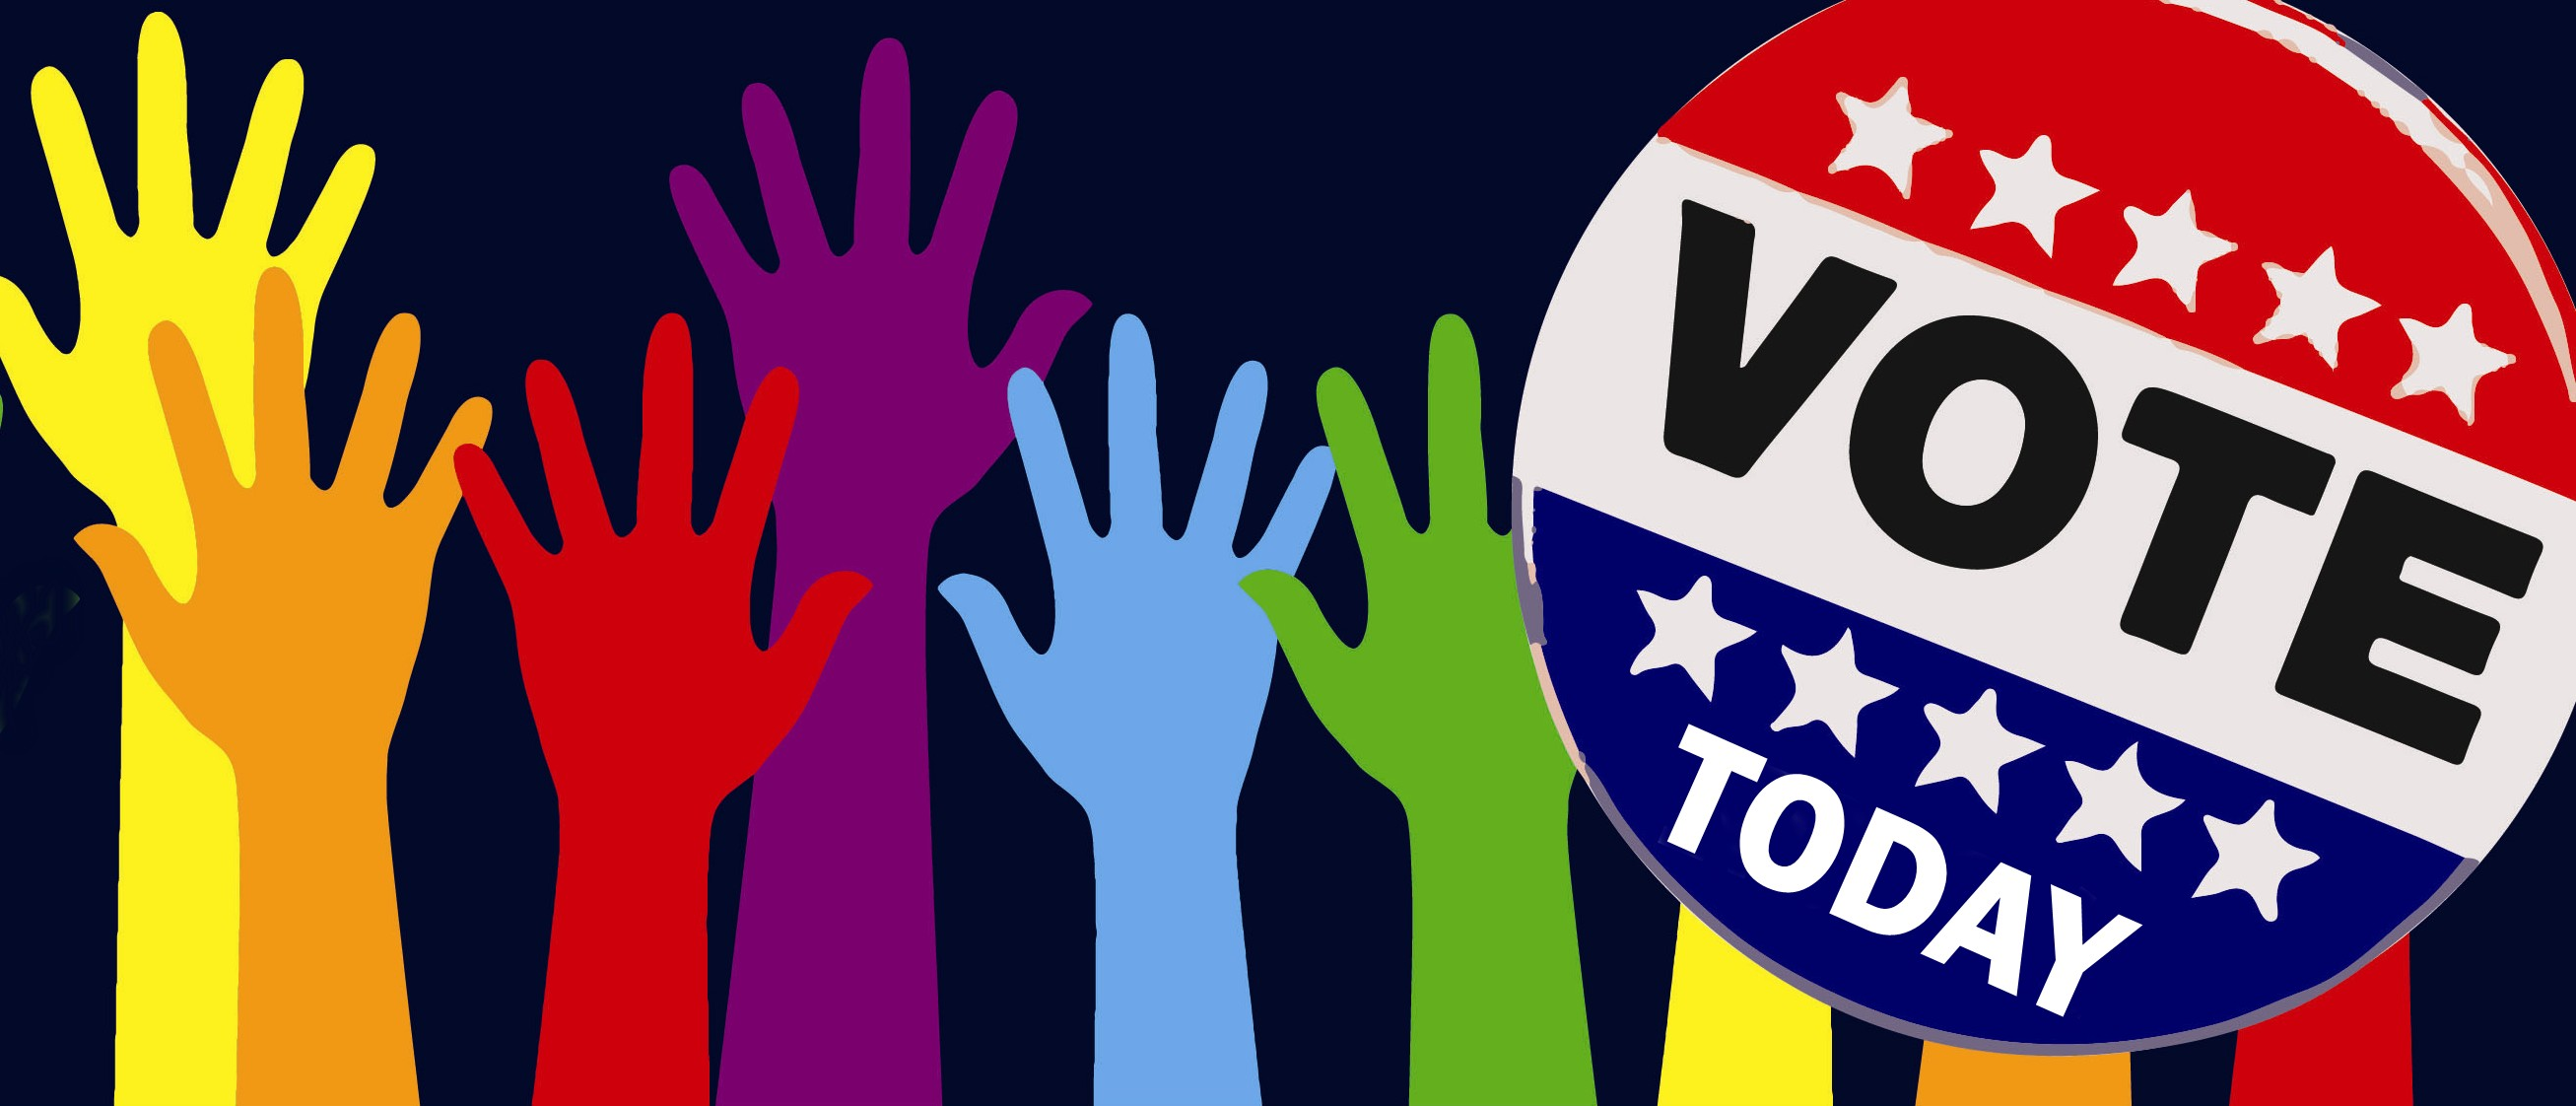 where can i vote - photo #39